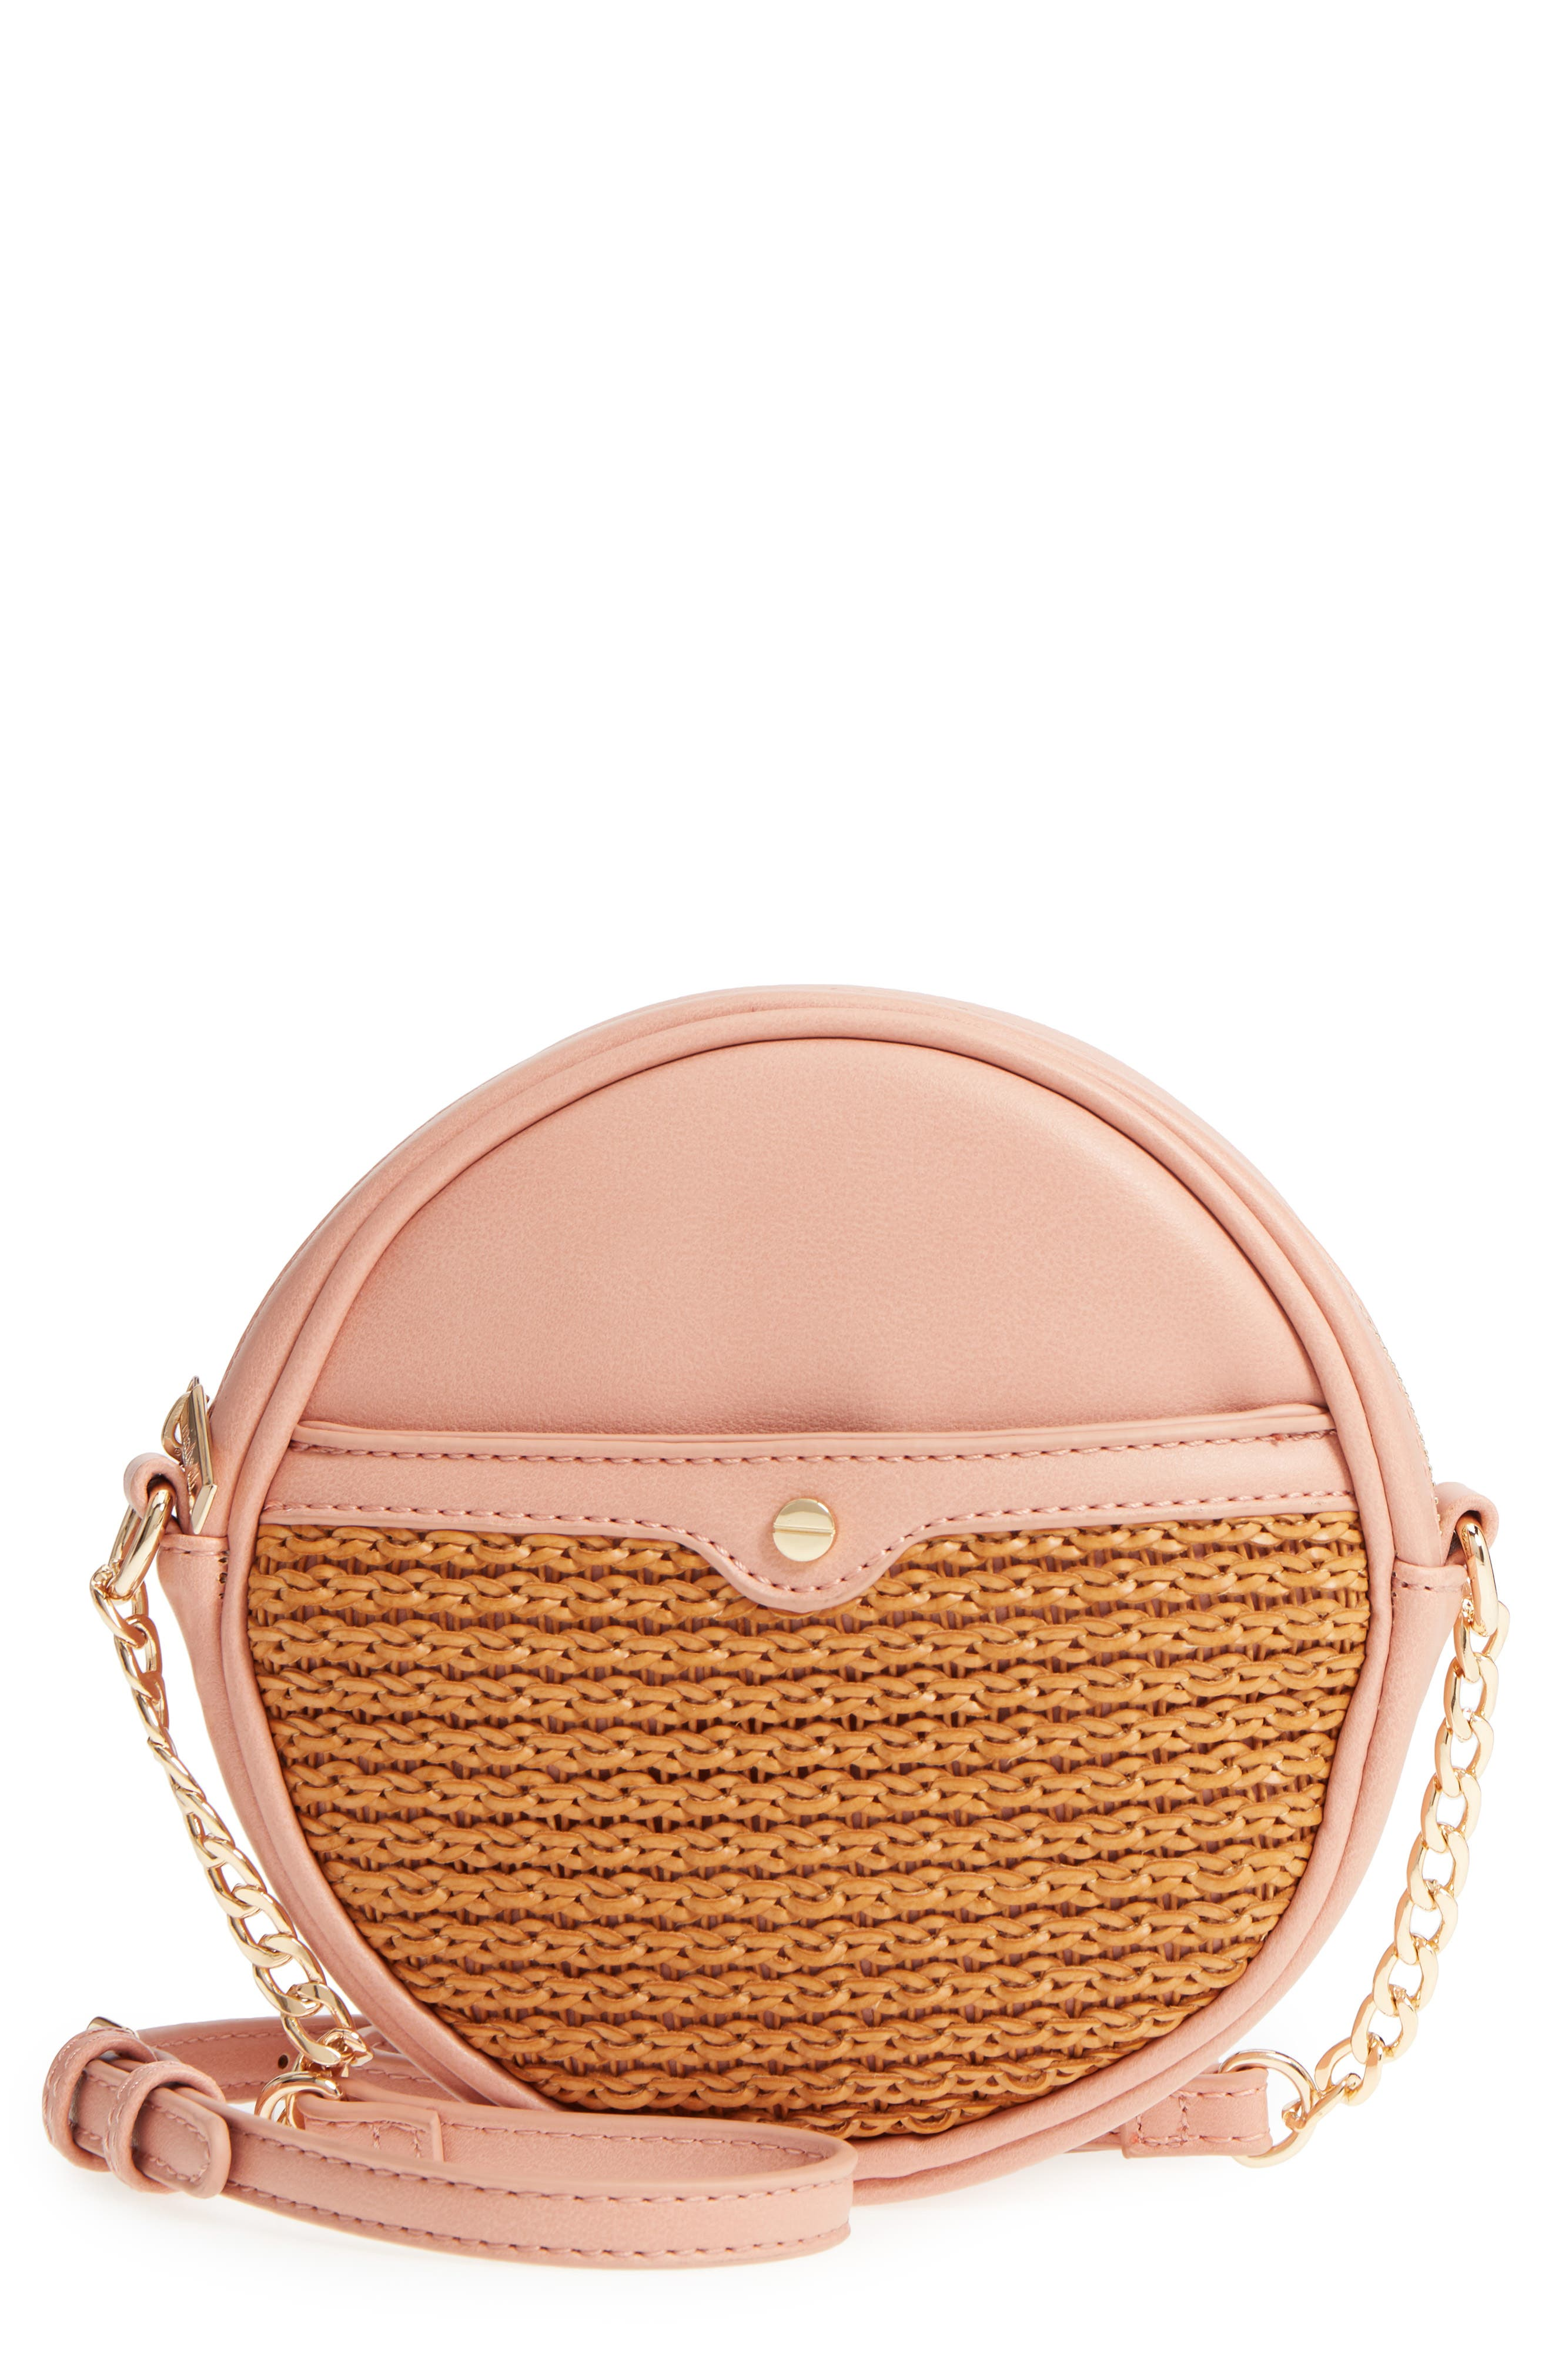 Mali + Lili Basket Weave Vegan Leather Canteen Crossbody Bag,                             Main thumbnail 1, color,                             200